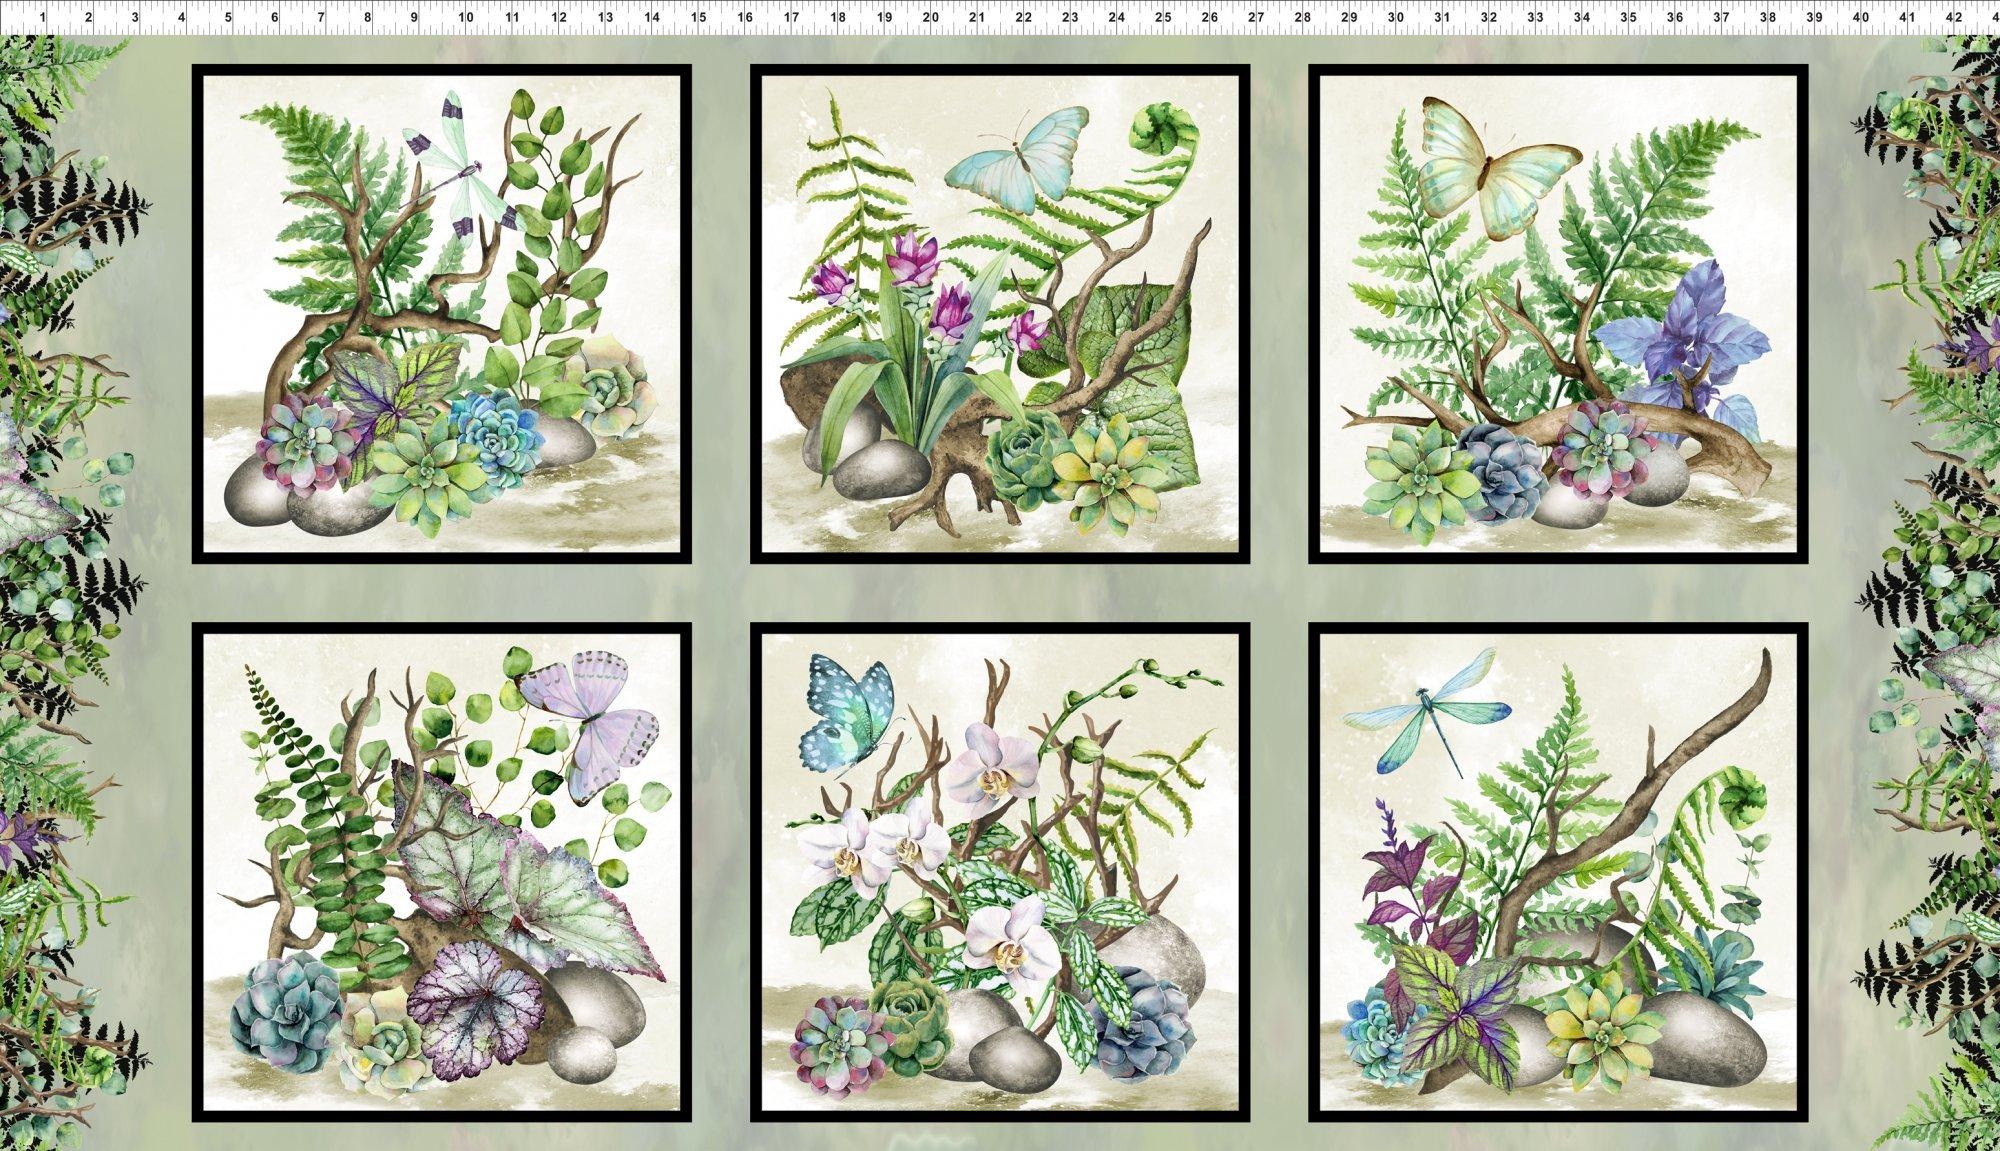 Terrarium - Digital Floral Panel #267 1TER 1